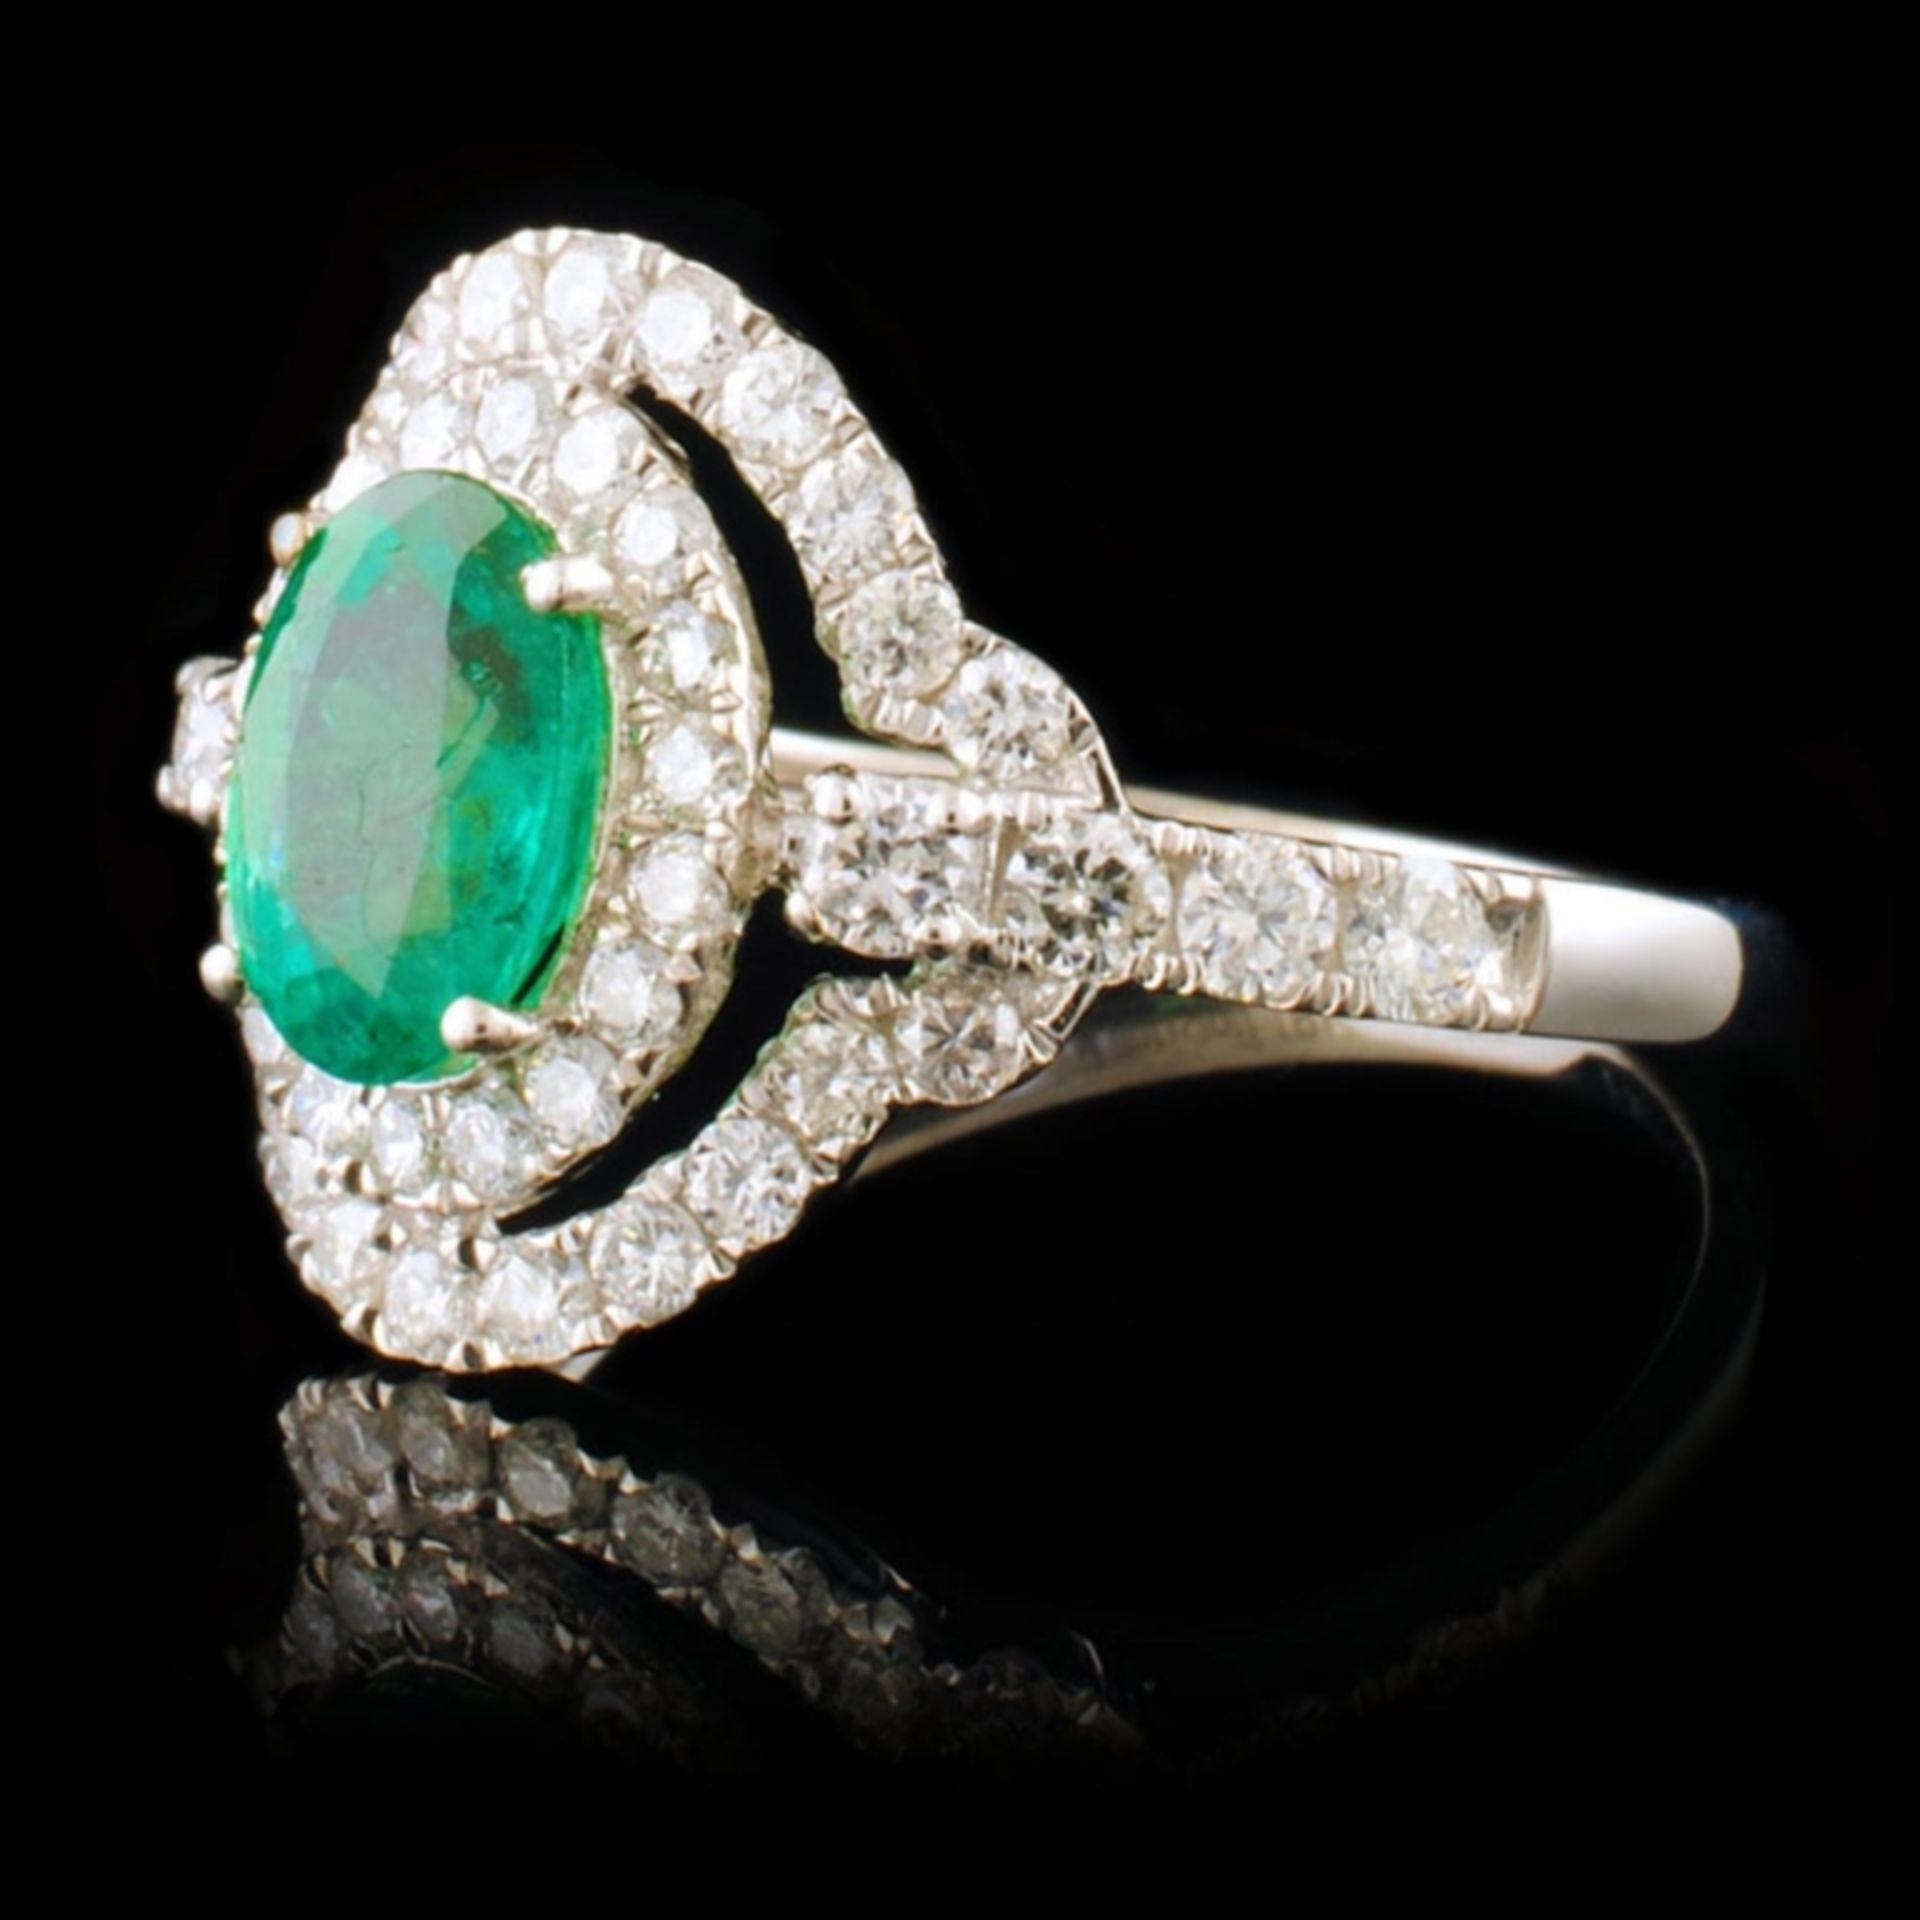 18k White Gold 0.93ct Emerald & 0.82ctw Diamond Ri - Image 2 of 4